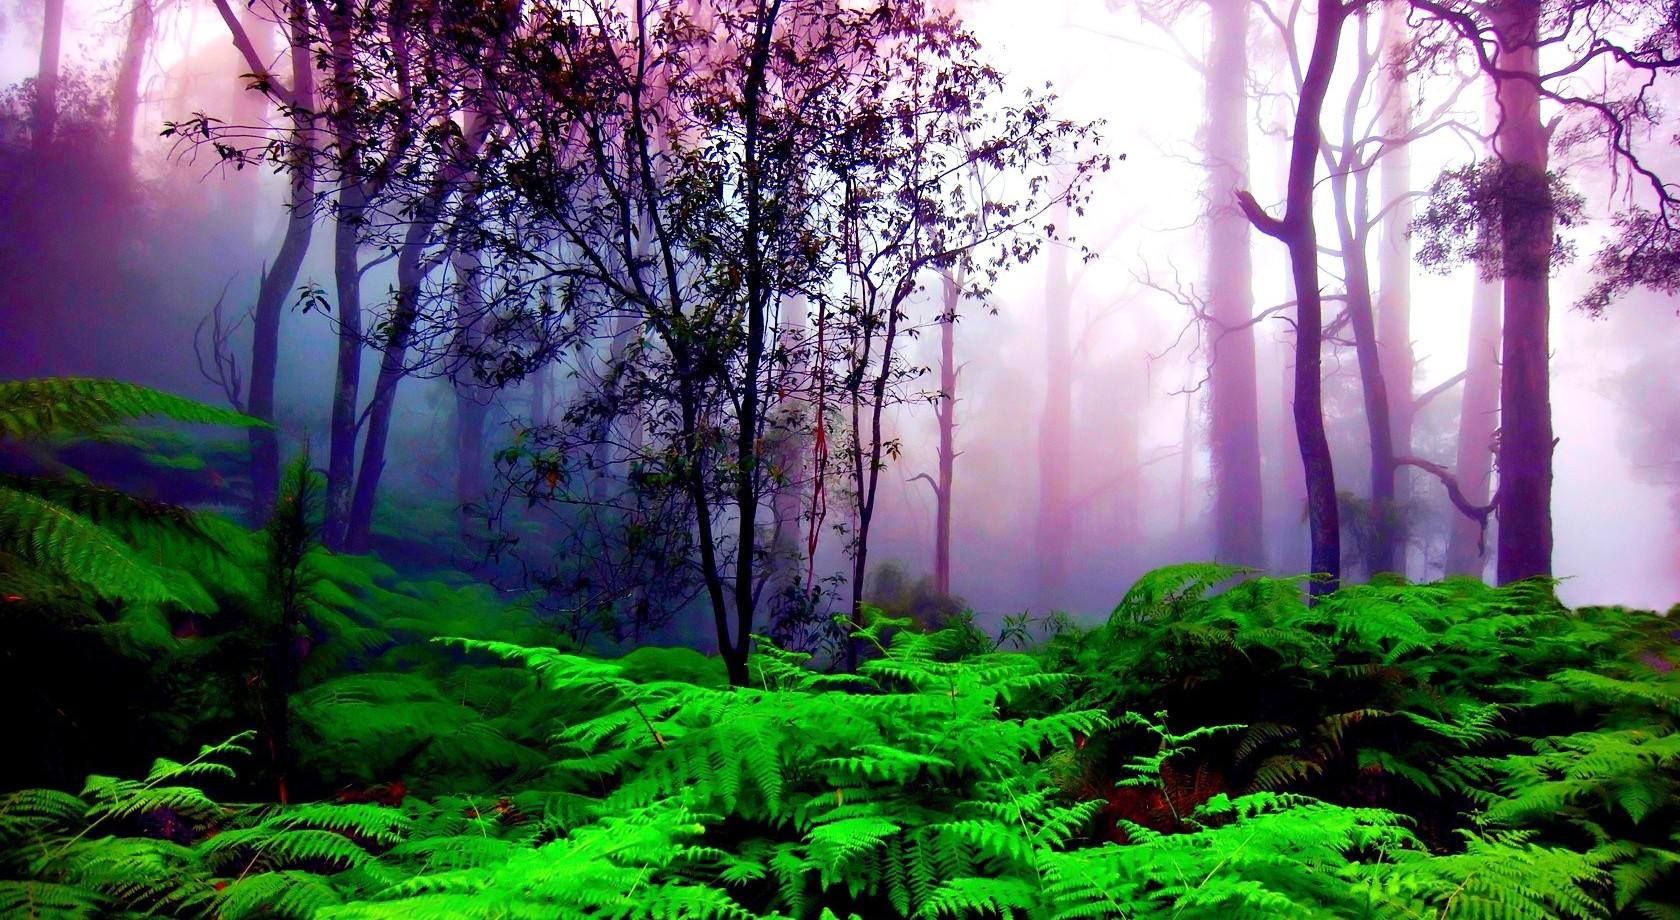 Purple and green nature wallpaper   ForWallpapercom 1680x920